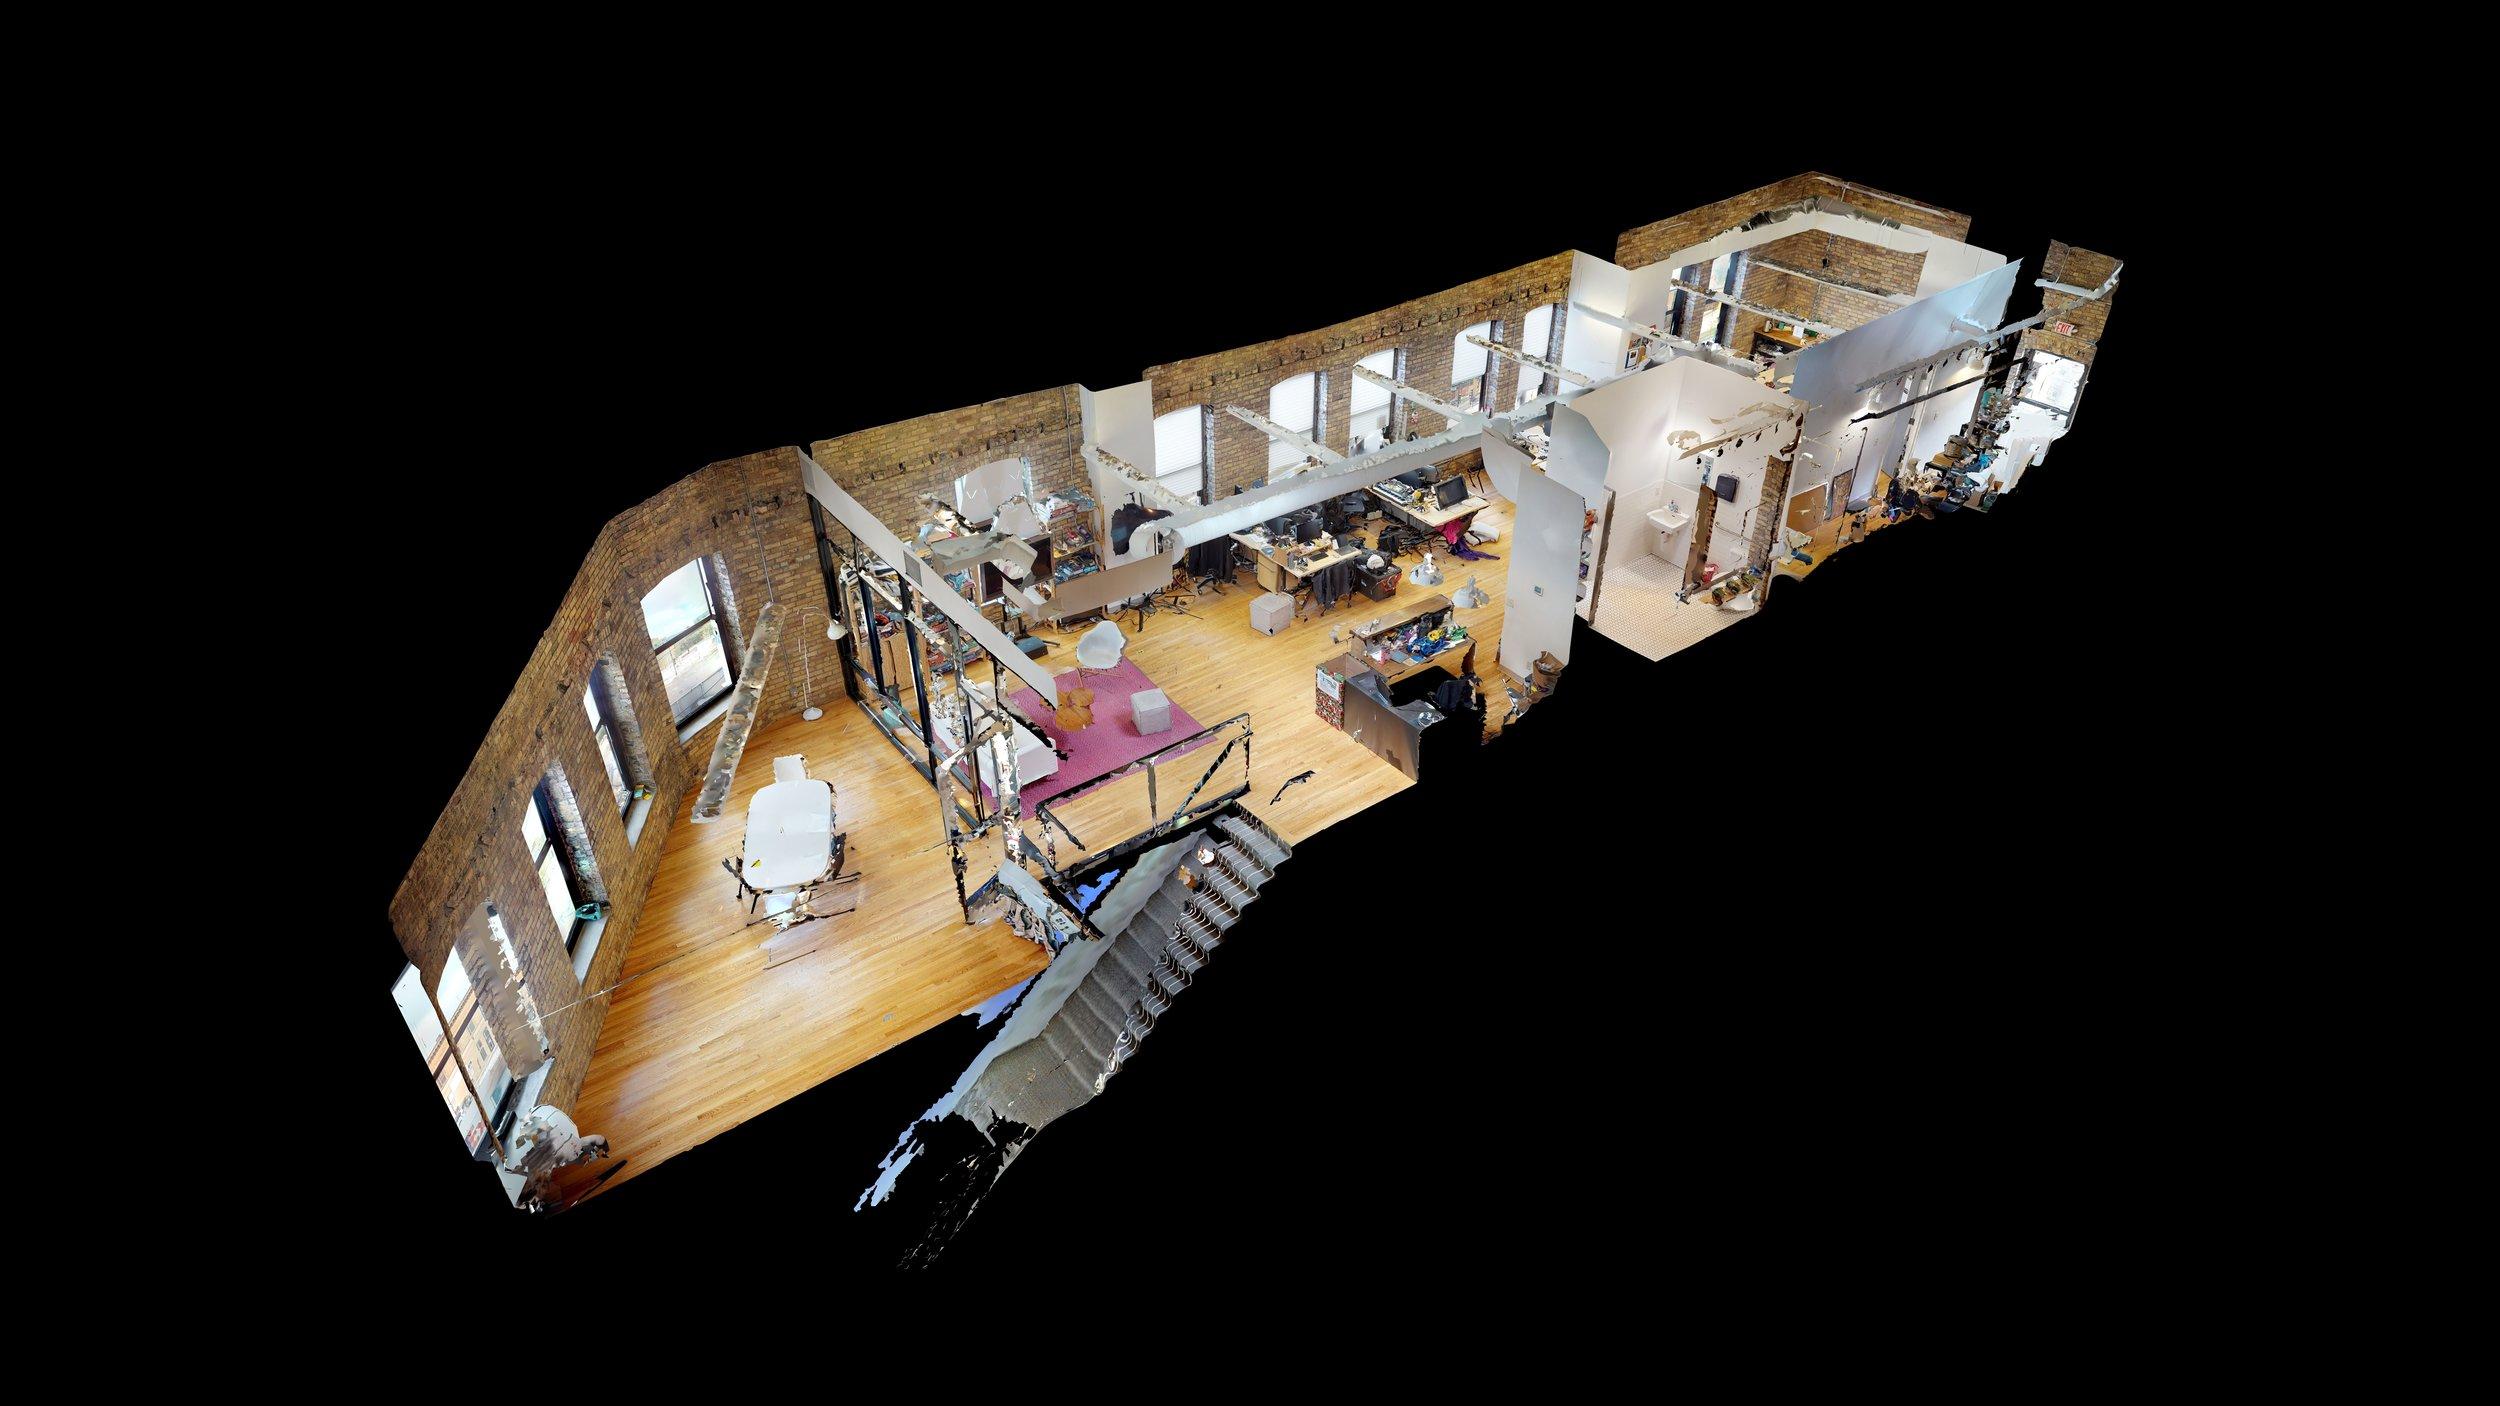 Glitch-Office-Space-Dollhouse-View.jpg